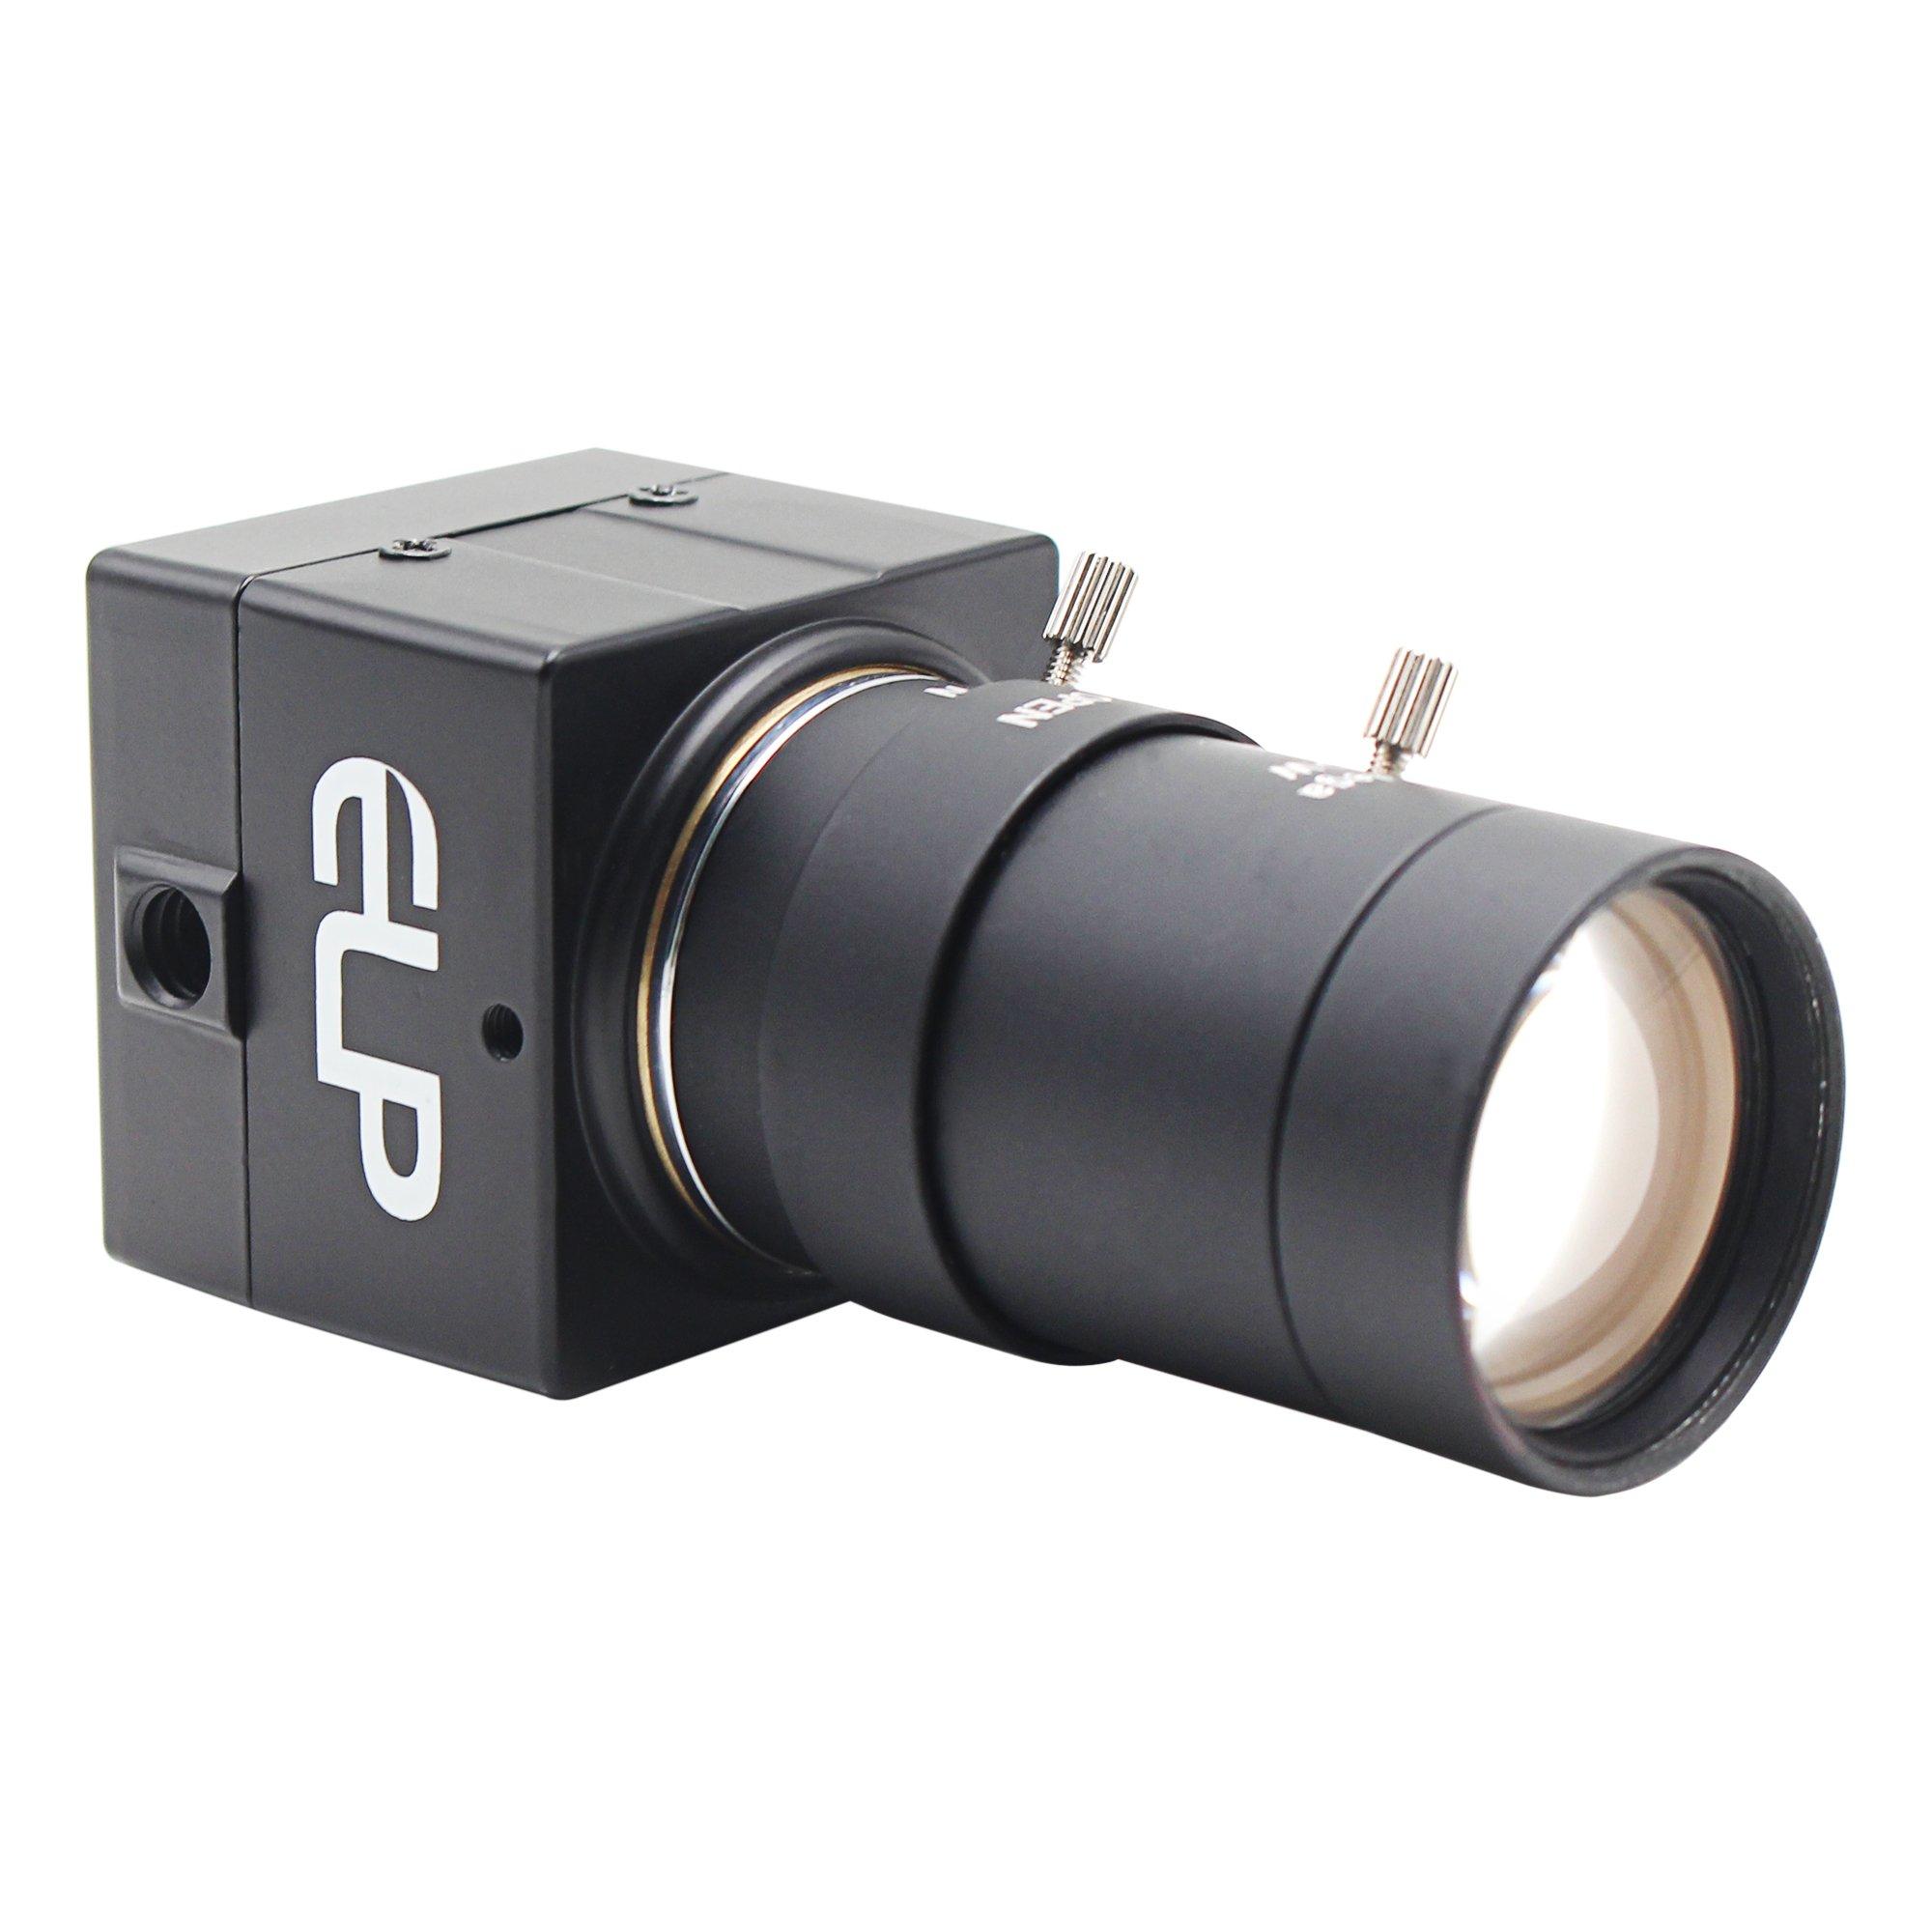 Camera USB 8MP 5-50mm Manual Varifocal Lens Webcam Sony IMX179 Sensor for PC ELP